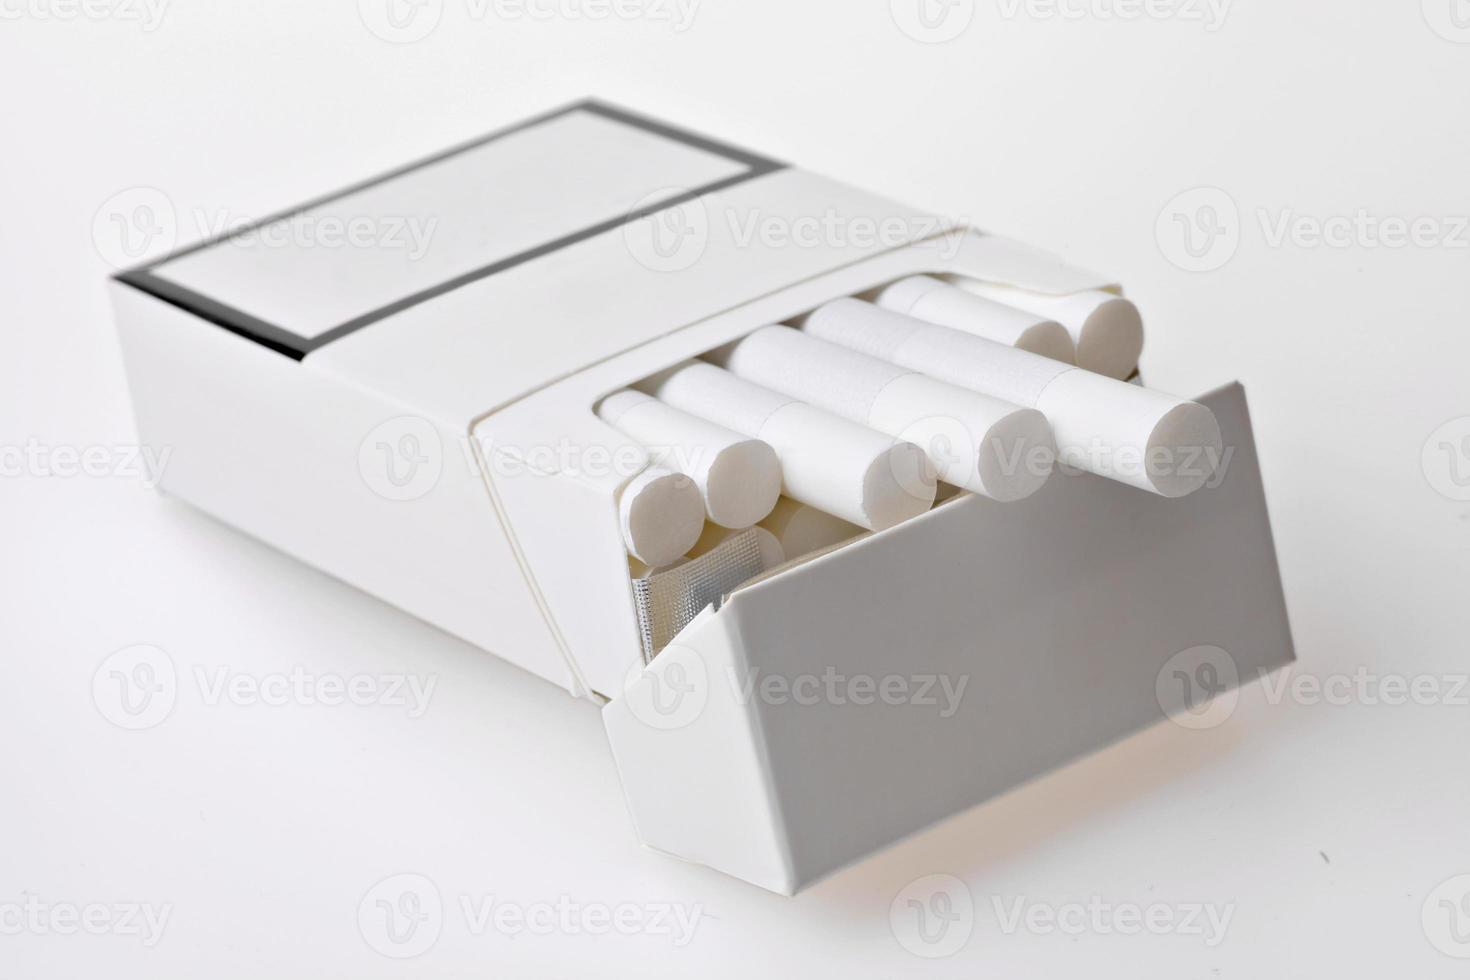 Zigarettenpackung foto